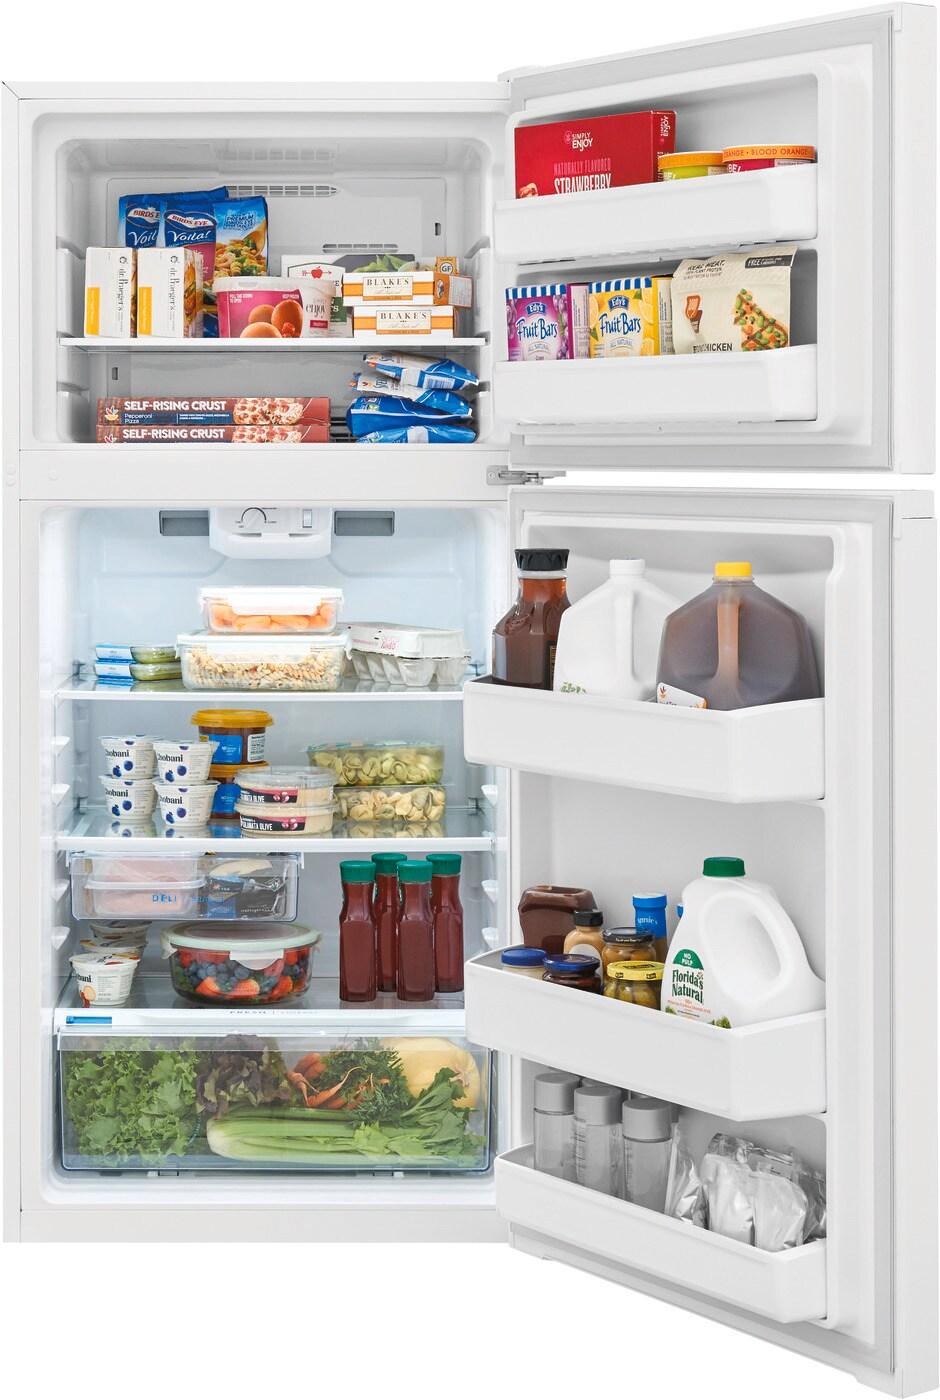 Model: FFHT1425VW | Frigidaire 13.9 Cu. Ft. Top Freezer Refrigerator